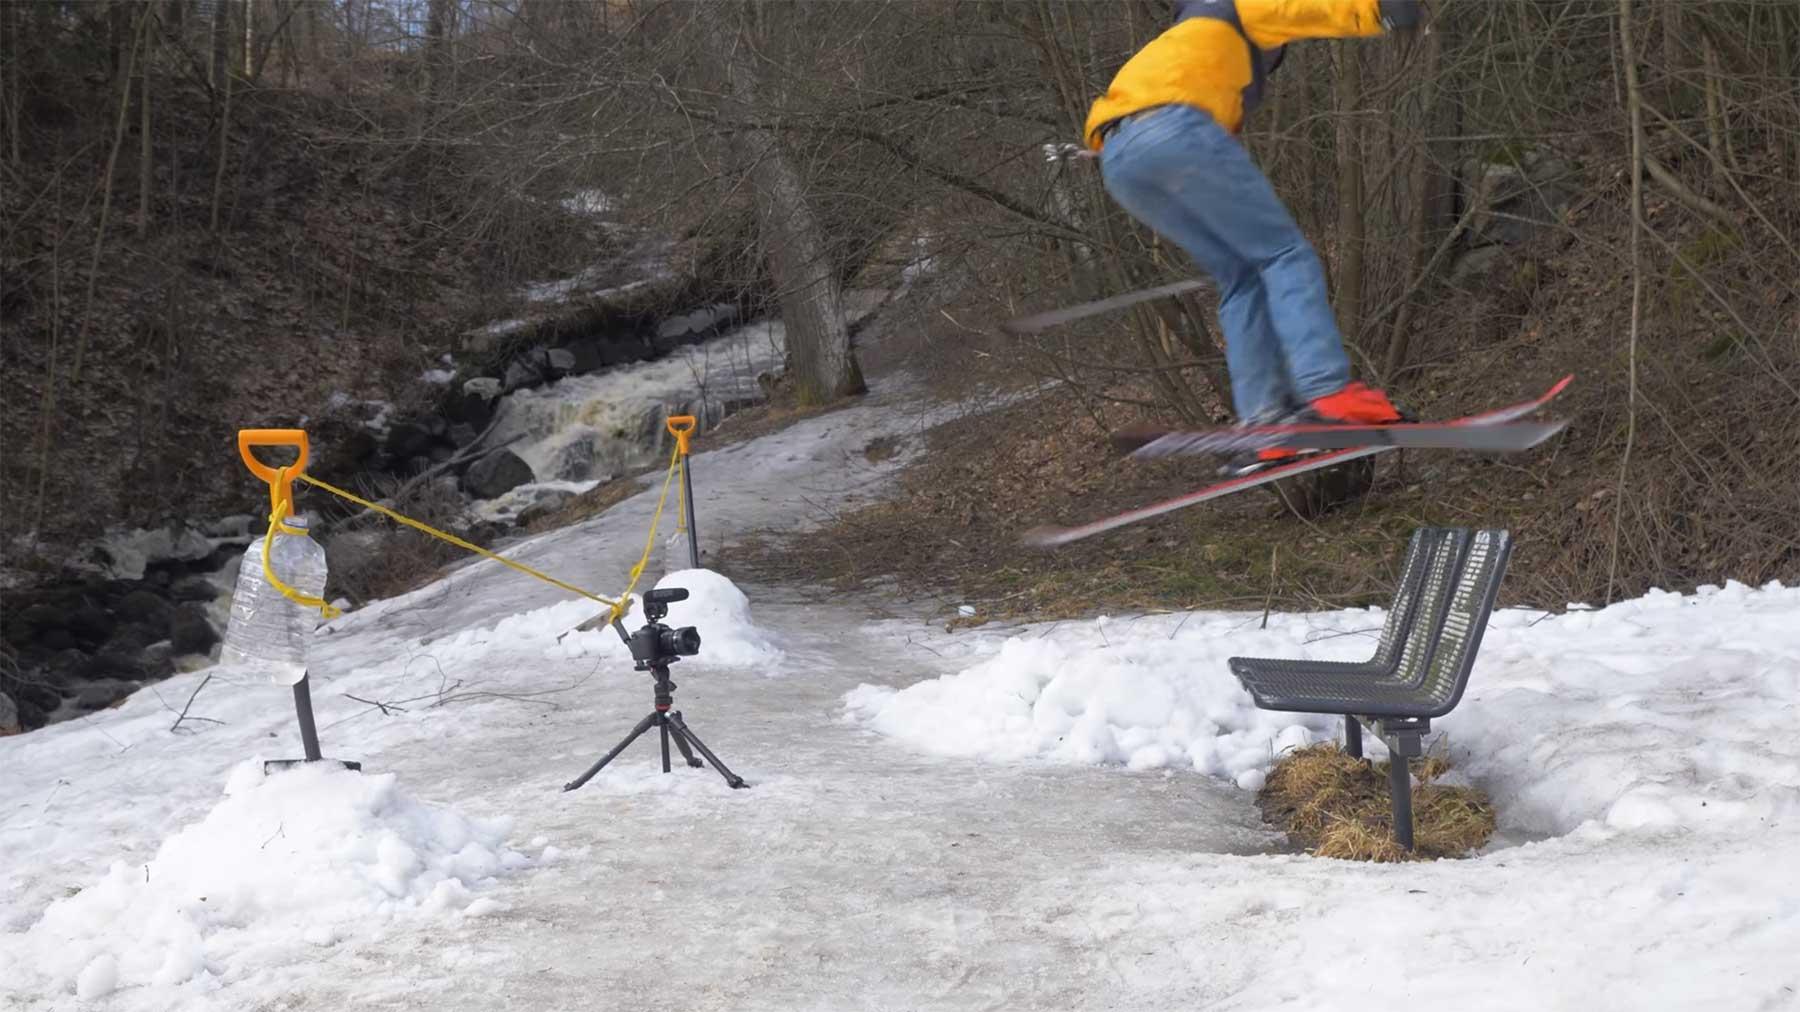 Social Distancing Skiing Juho-Kilkki-social-distancing-skiing